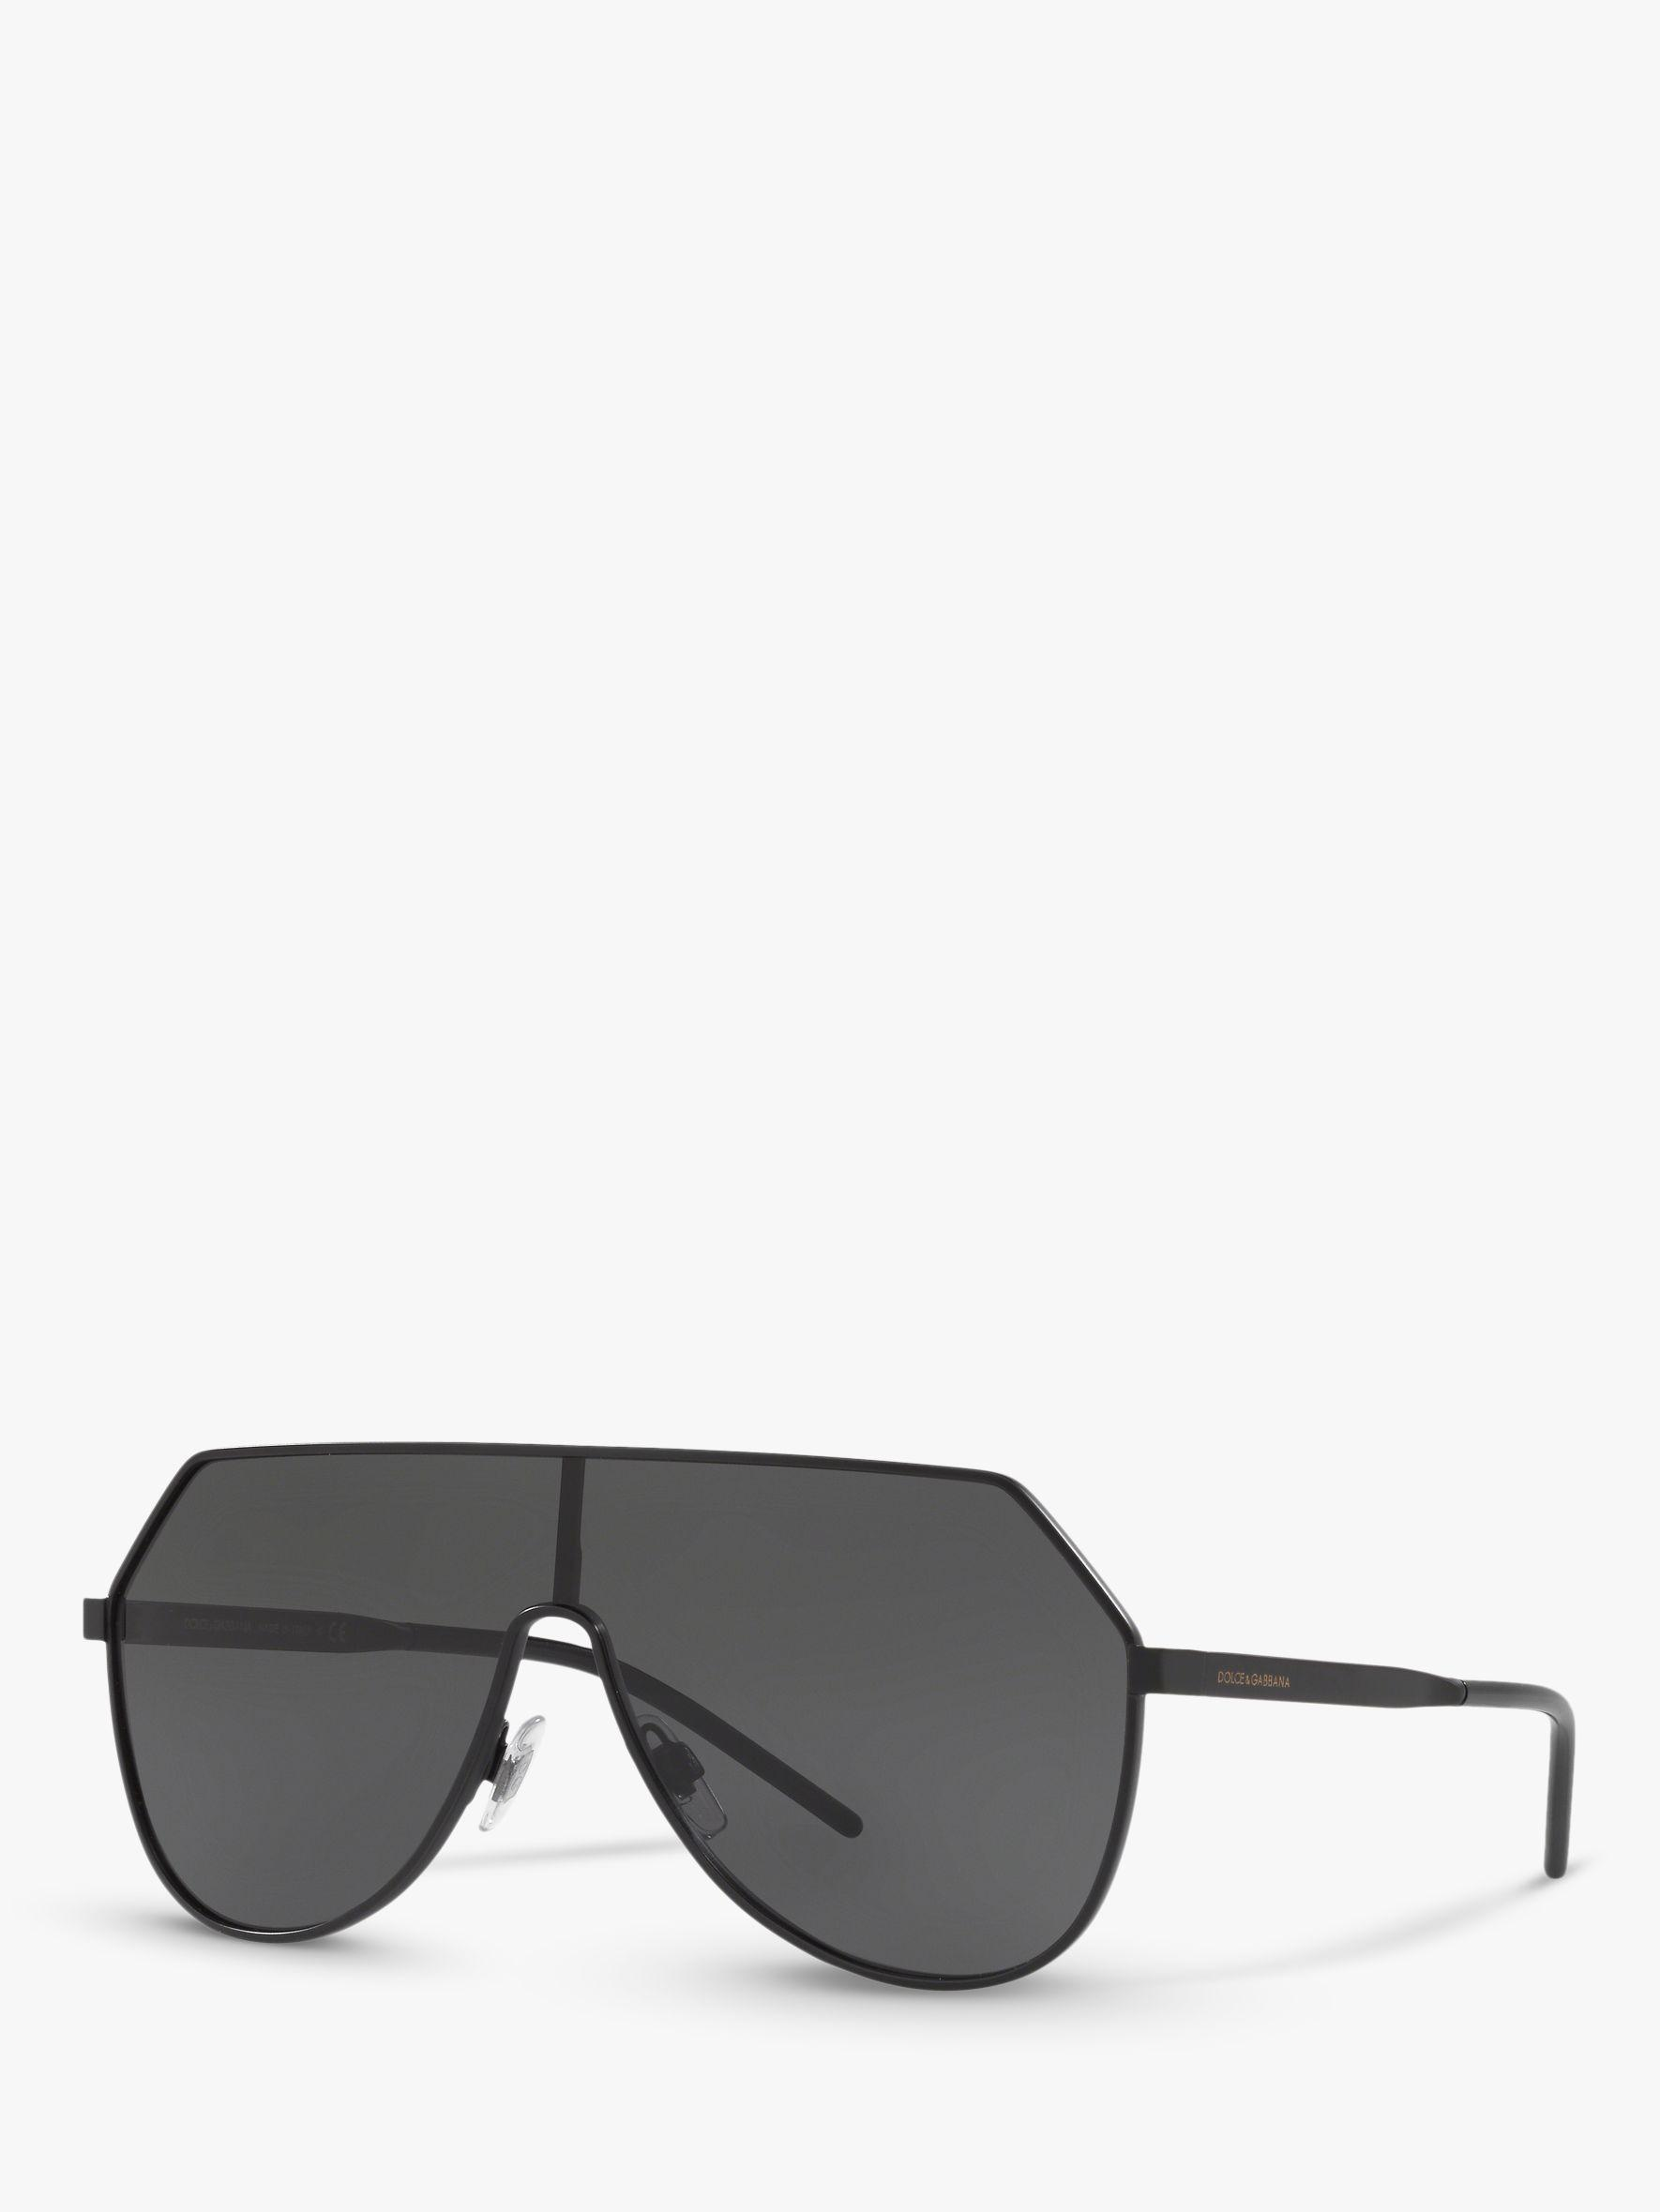 5a12805834460 Dolce   Gabbana. Black Dg2221 Men s Aviator Sunglasses. £232 From John Lewis  and Partners